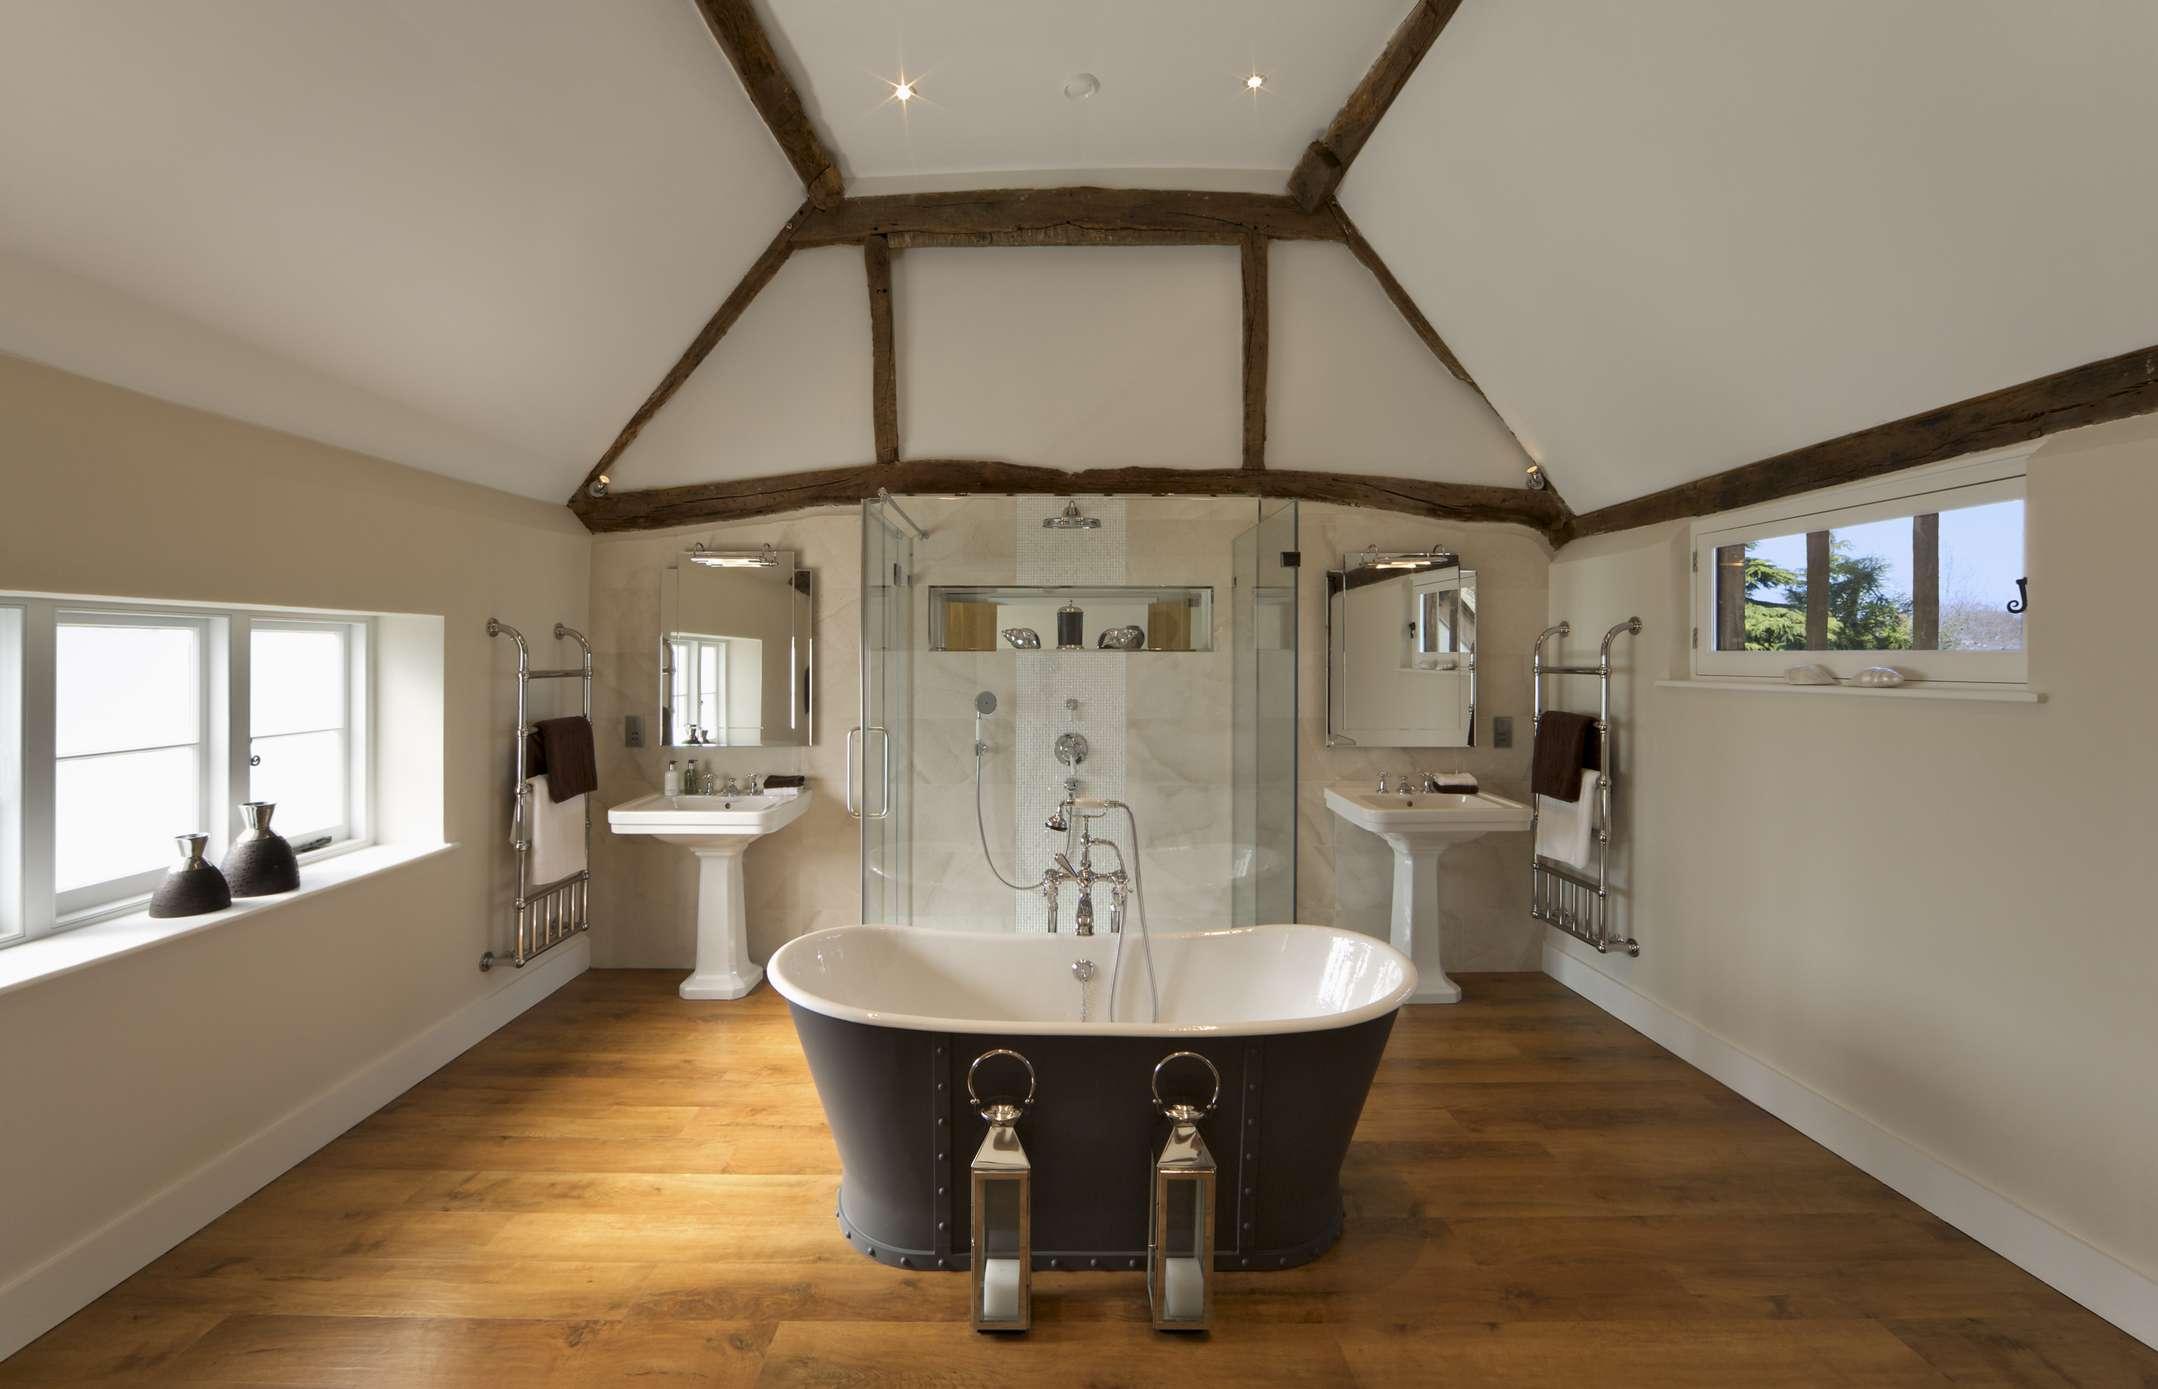 Modern bathroom in old farmhouse